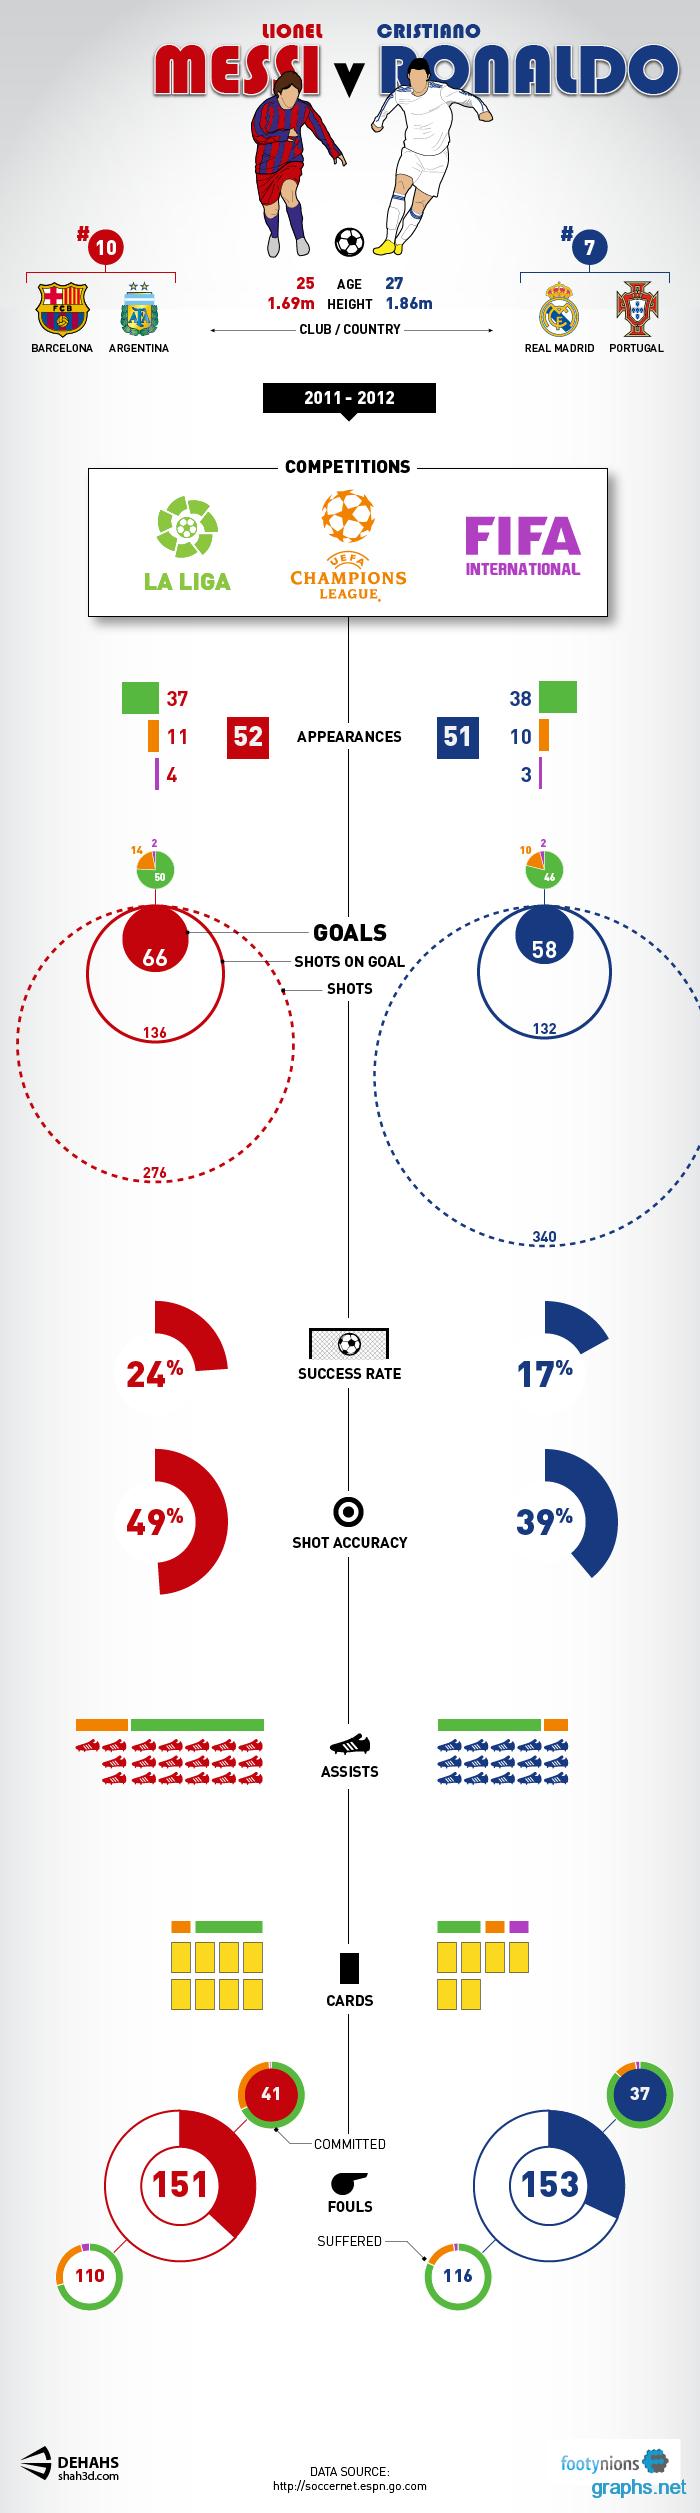 Messi-Vs-Ronaldo-Goals-2011-12